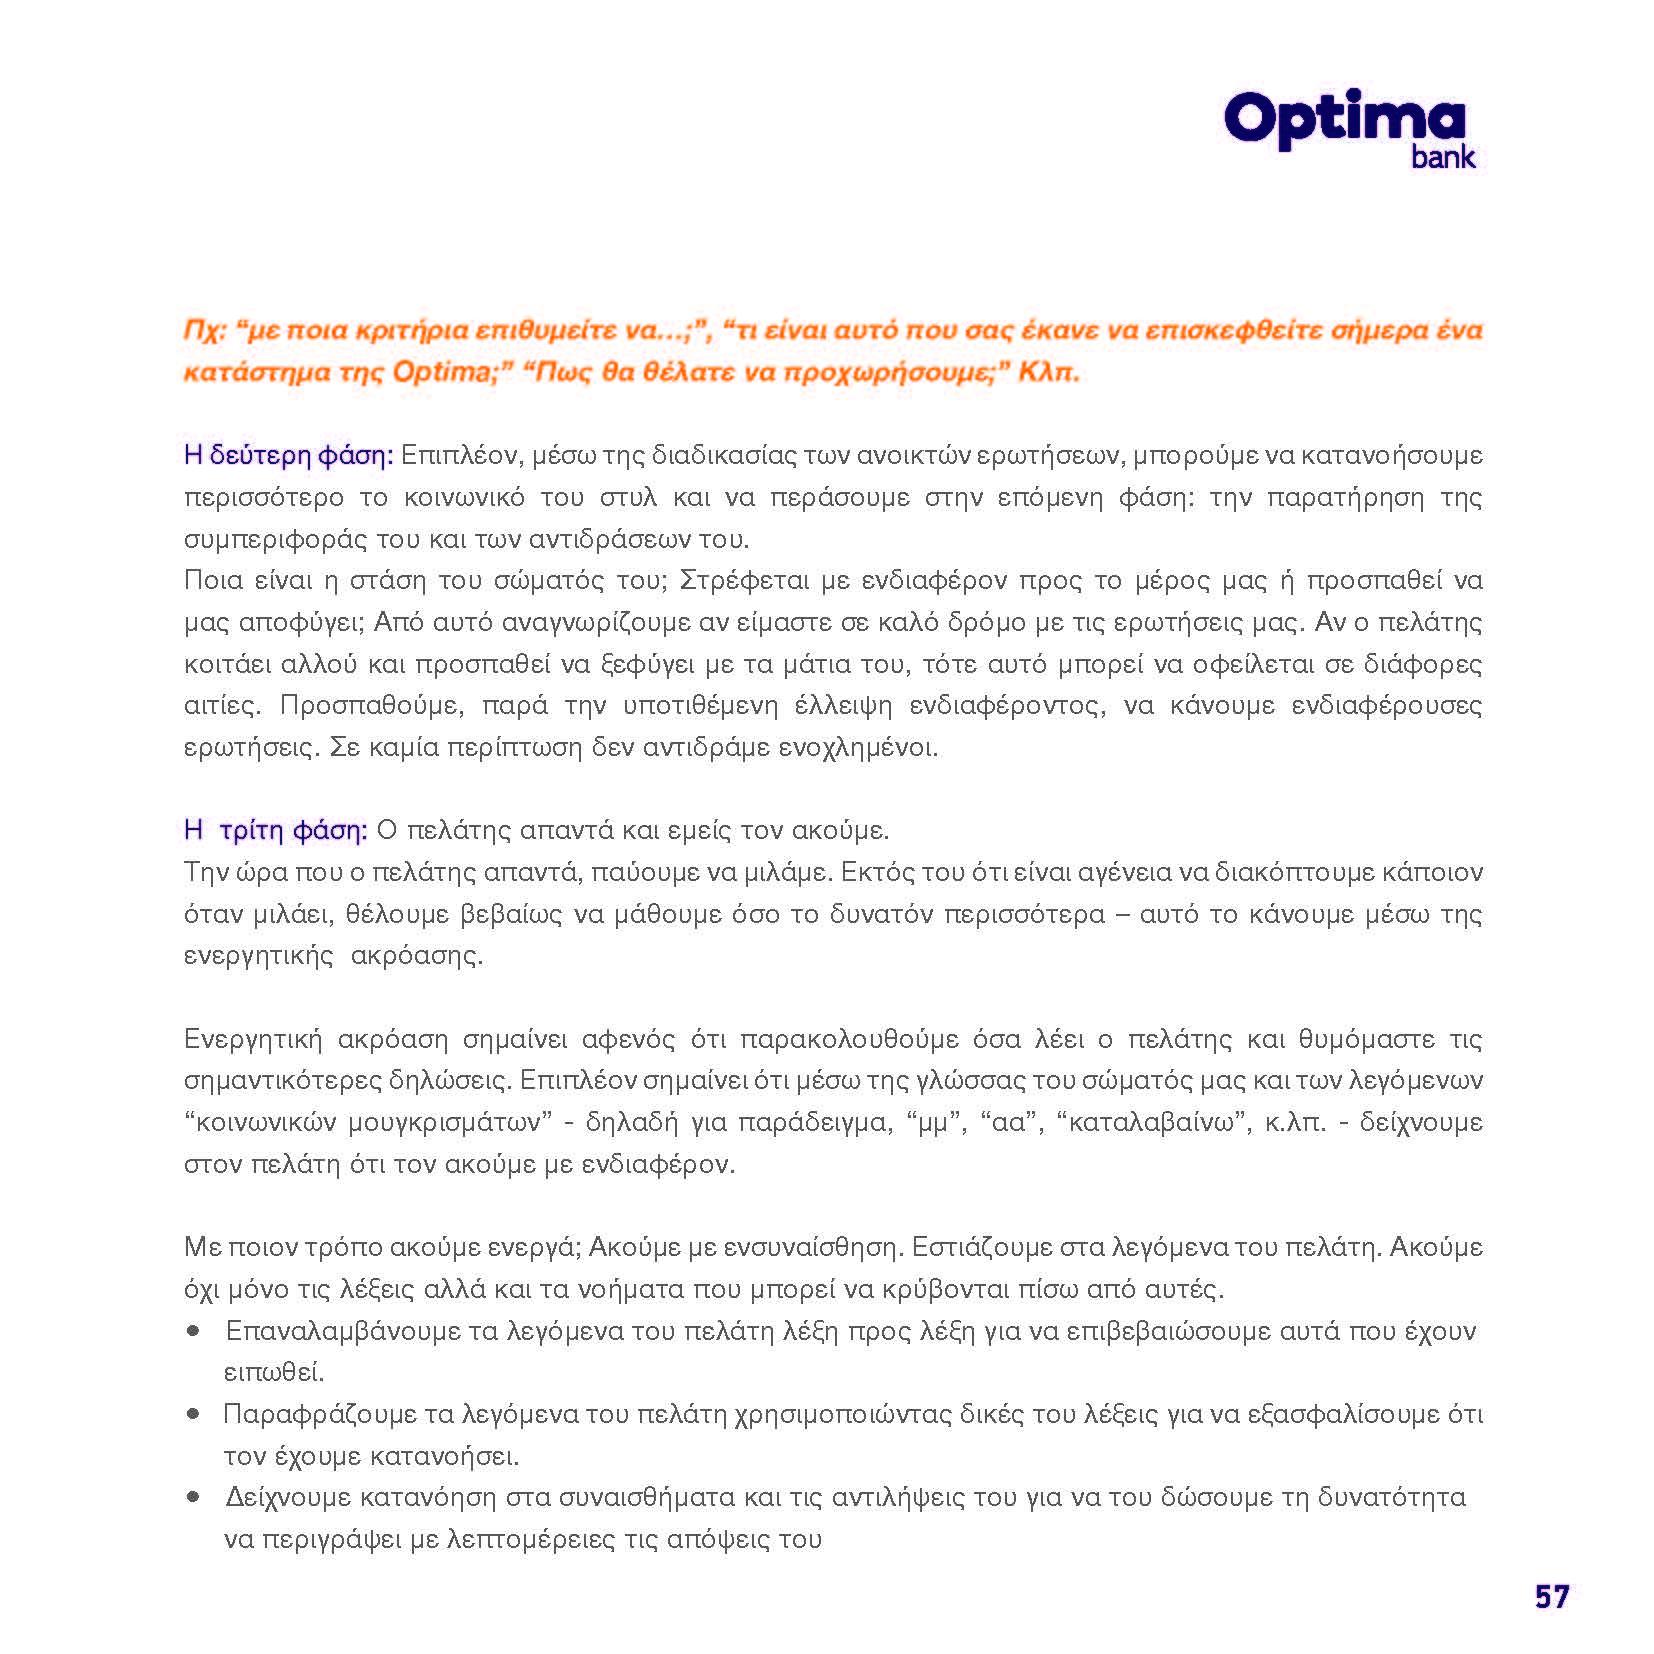 https://www.jib.gr/wp-content/uploads/2020/09/OPTIMA-BANK-BOOKLET-WEB_Page_057.jpg